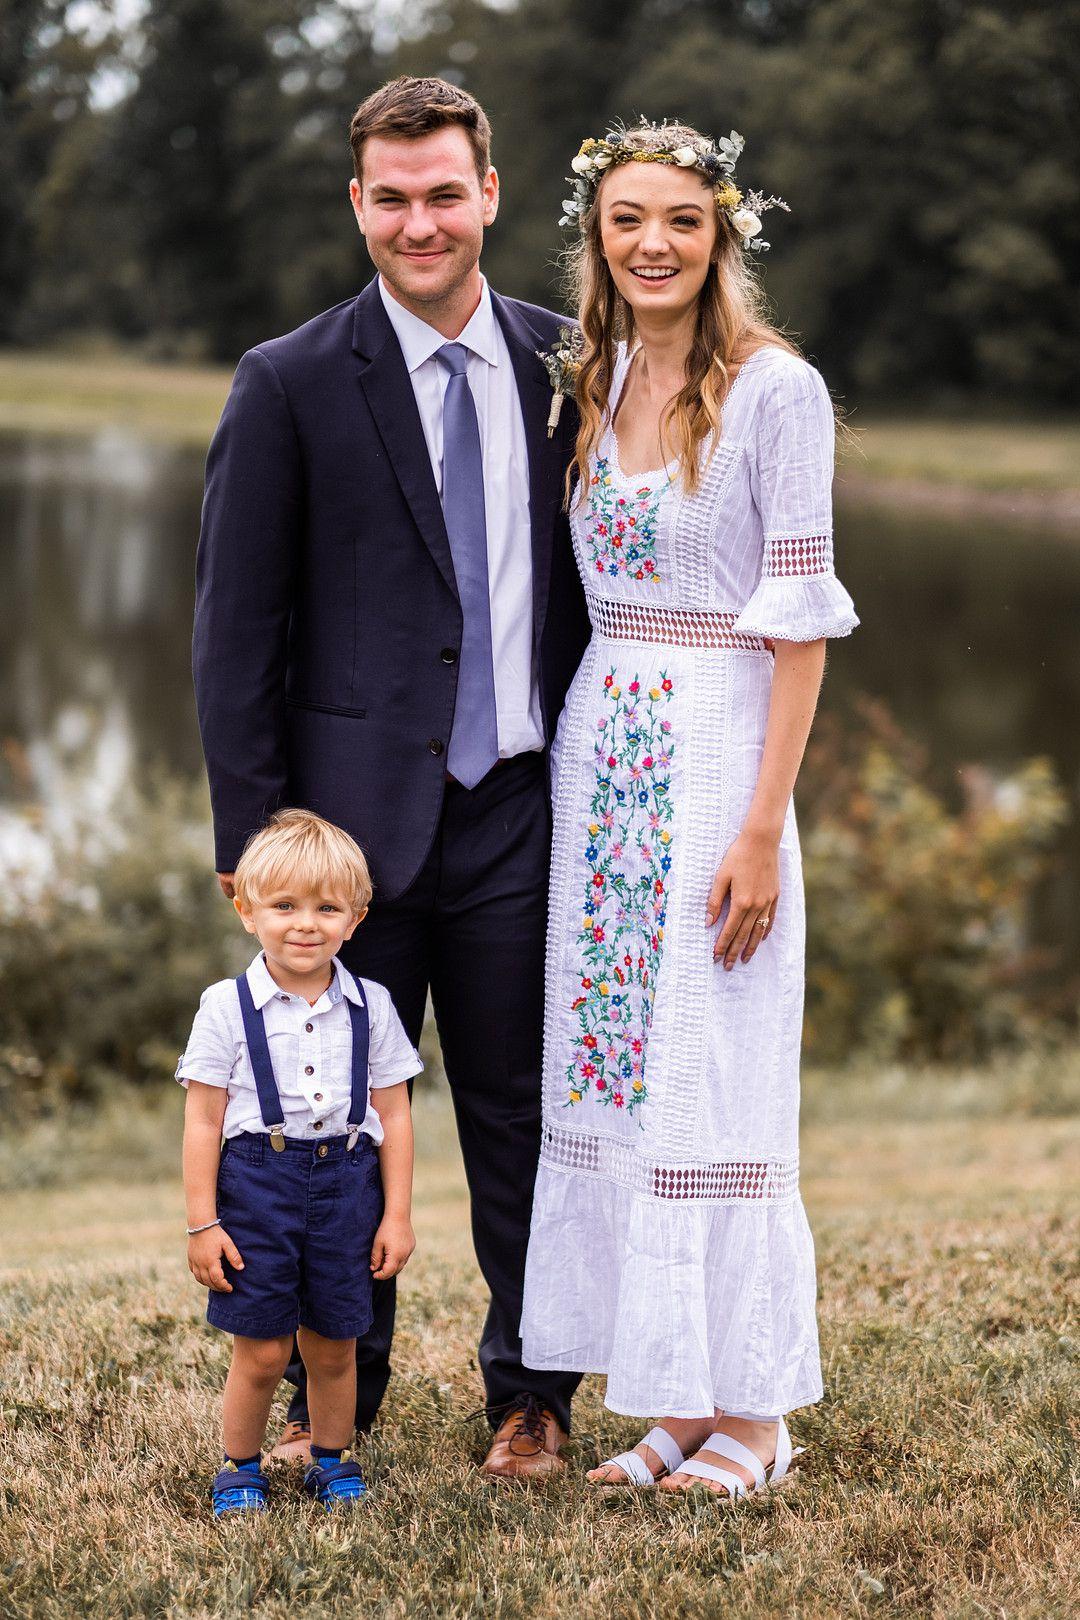 bride, groom, and ring bearer